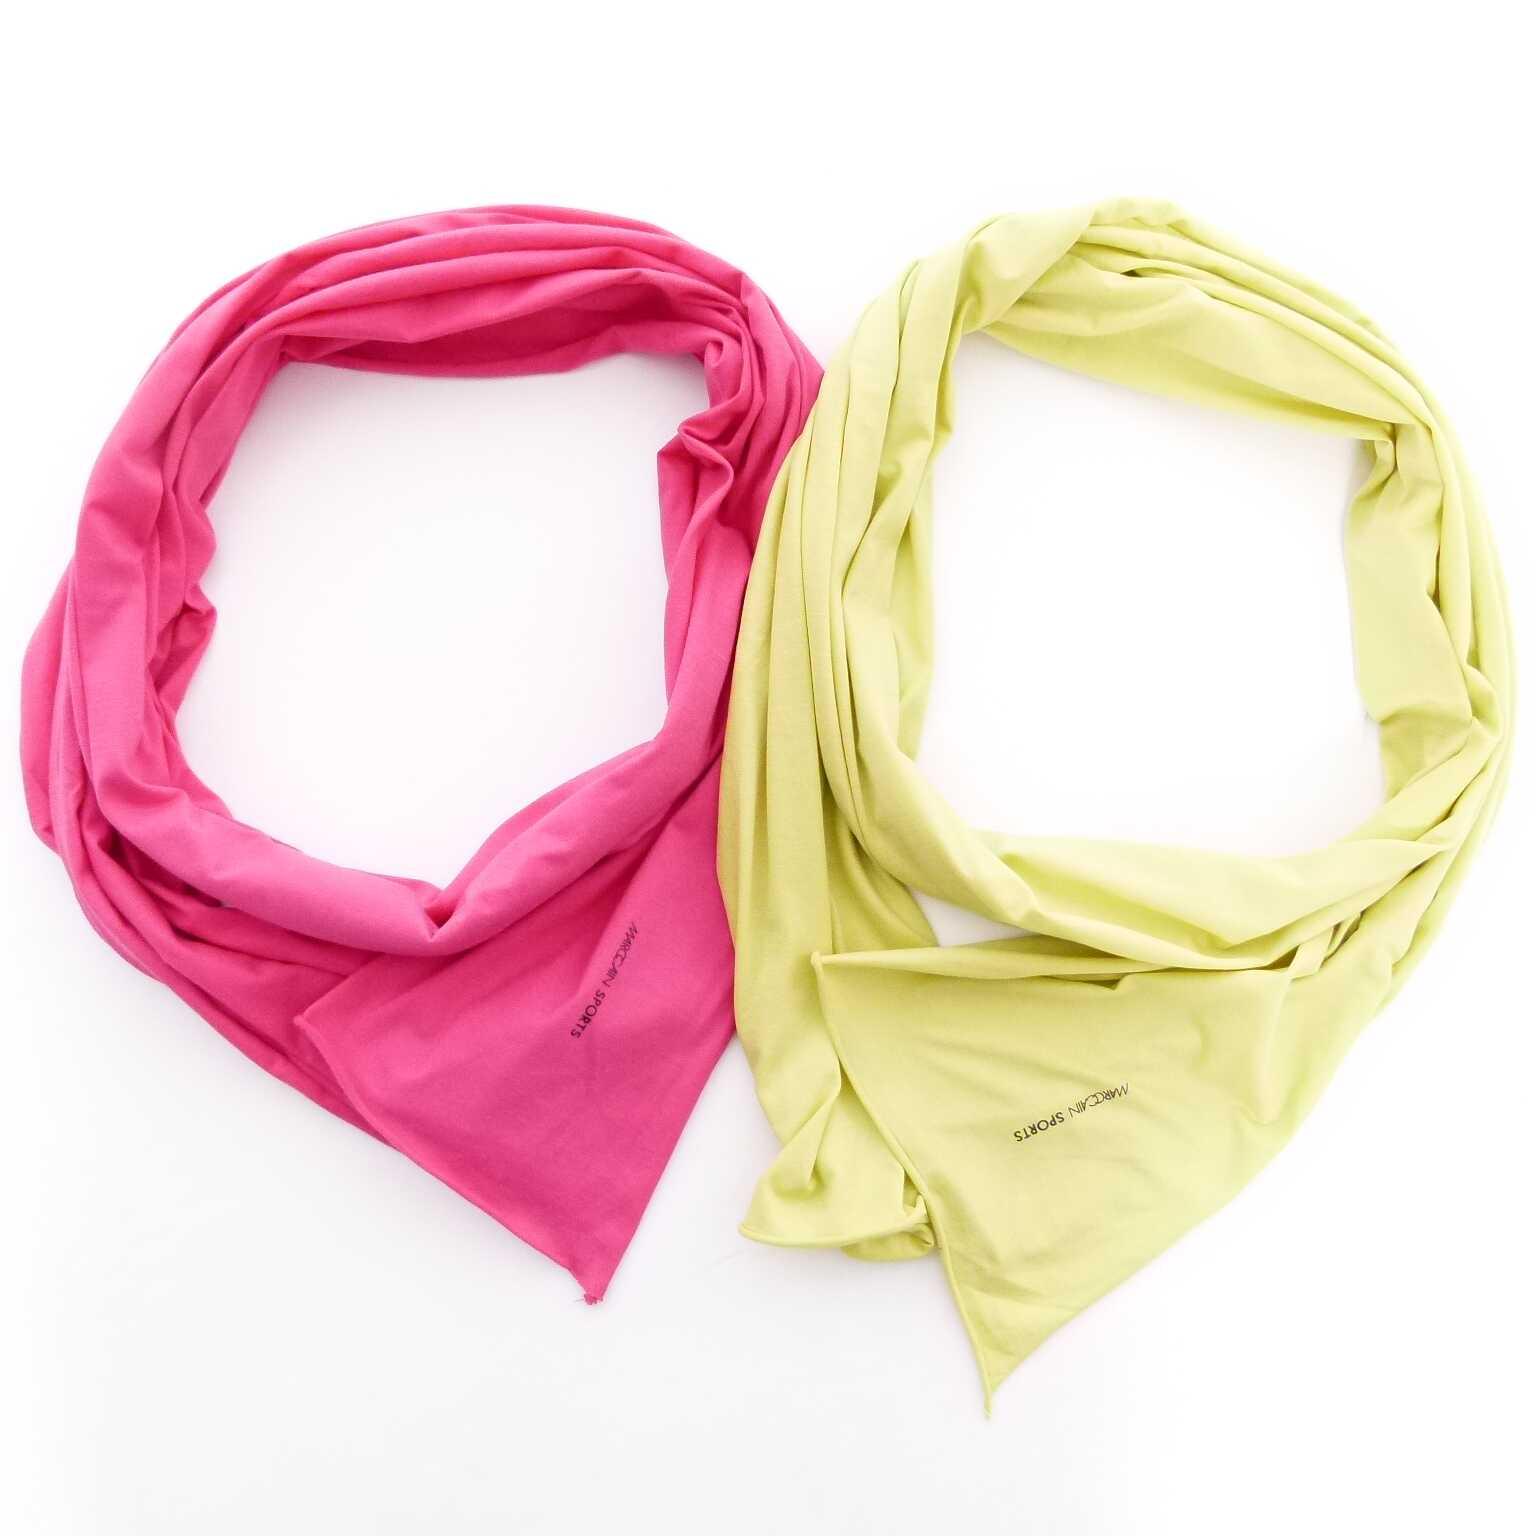 marc cain tuch 2er set gr n gelb pink hh women accessoires t cher schals. Black Bedroom Furniture Sets. Home Design Ideas